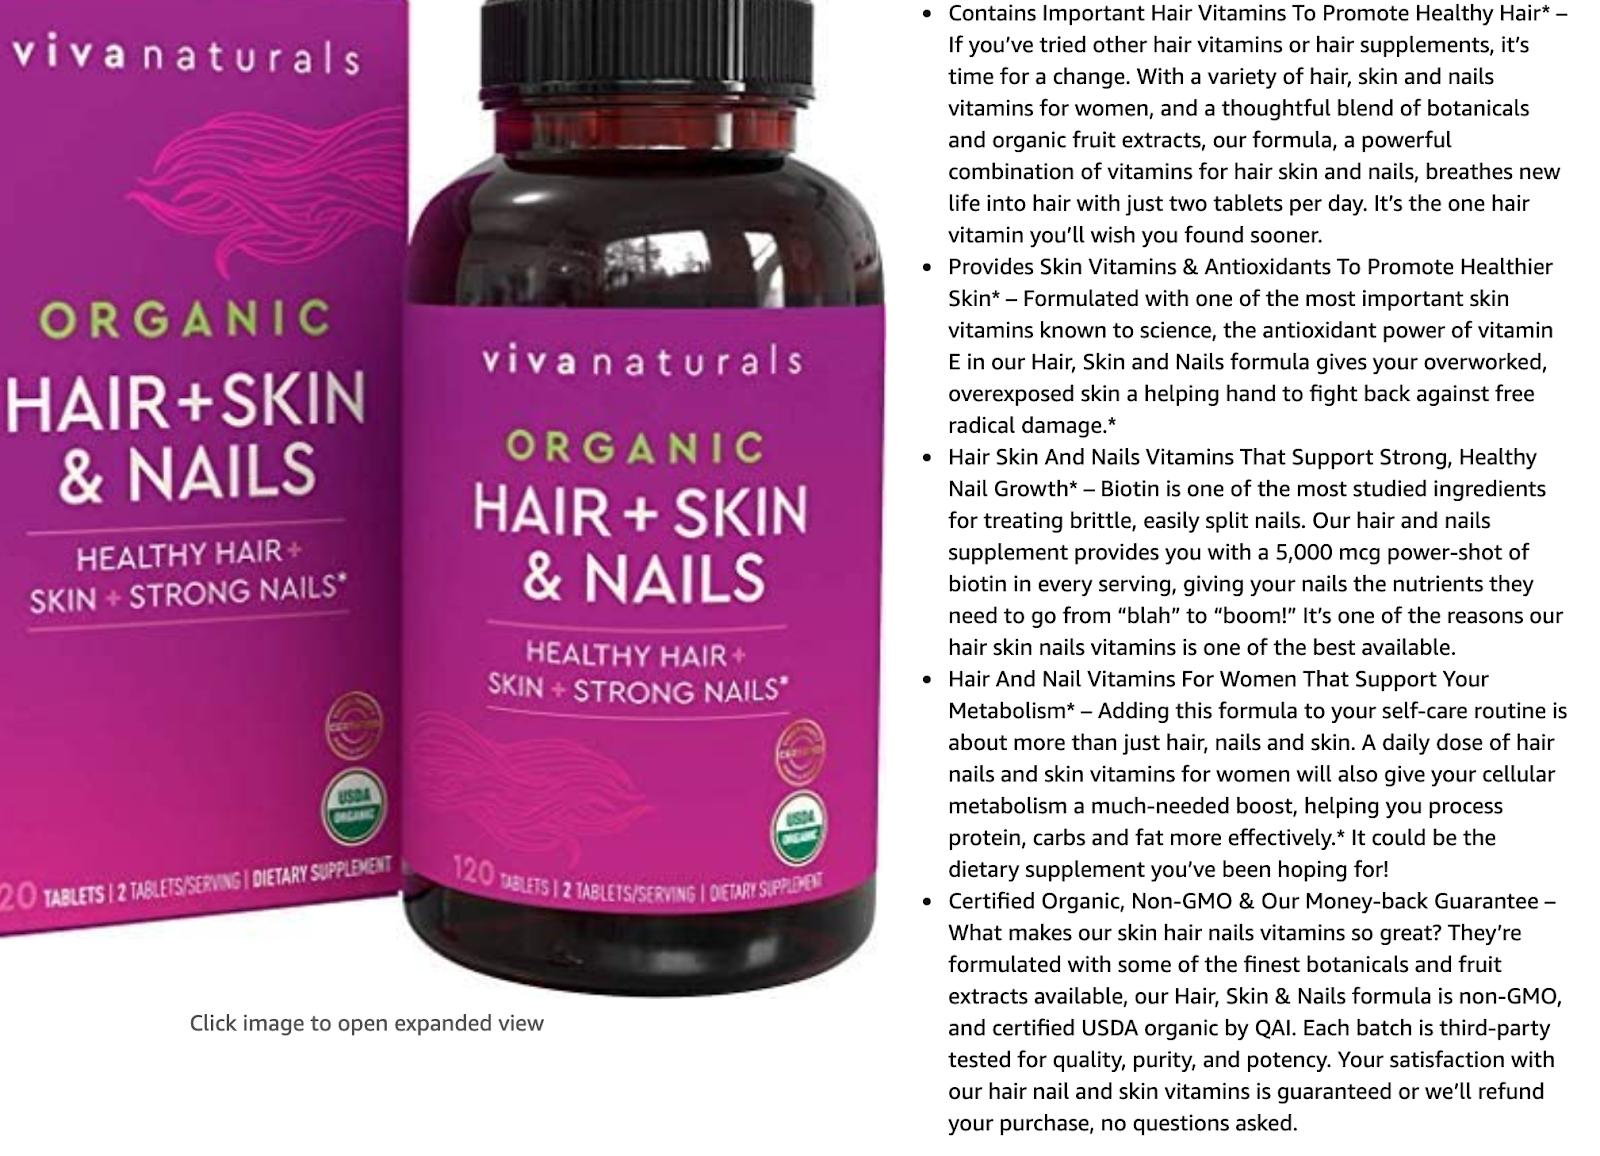 viva naturals product